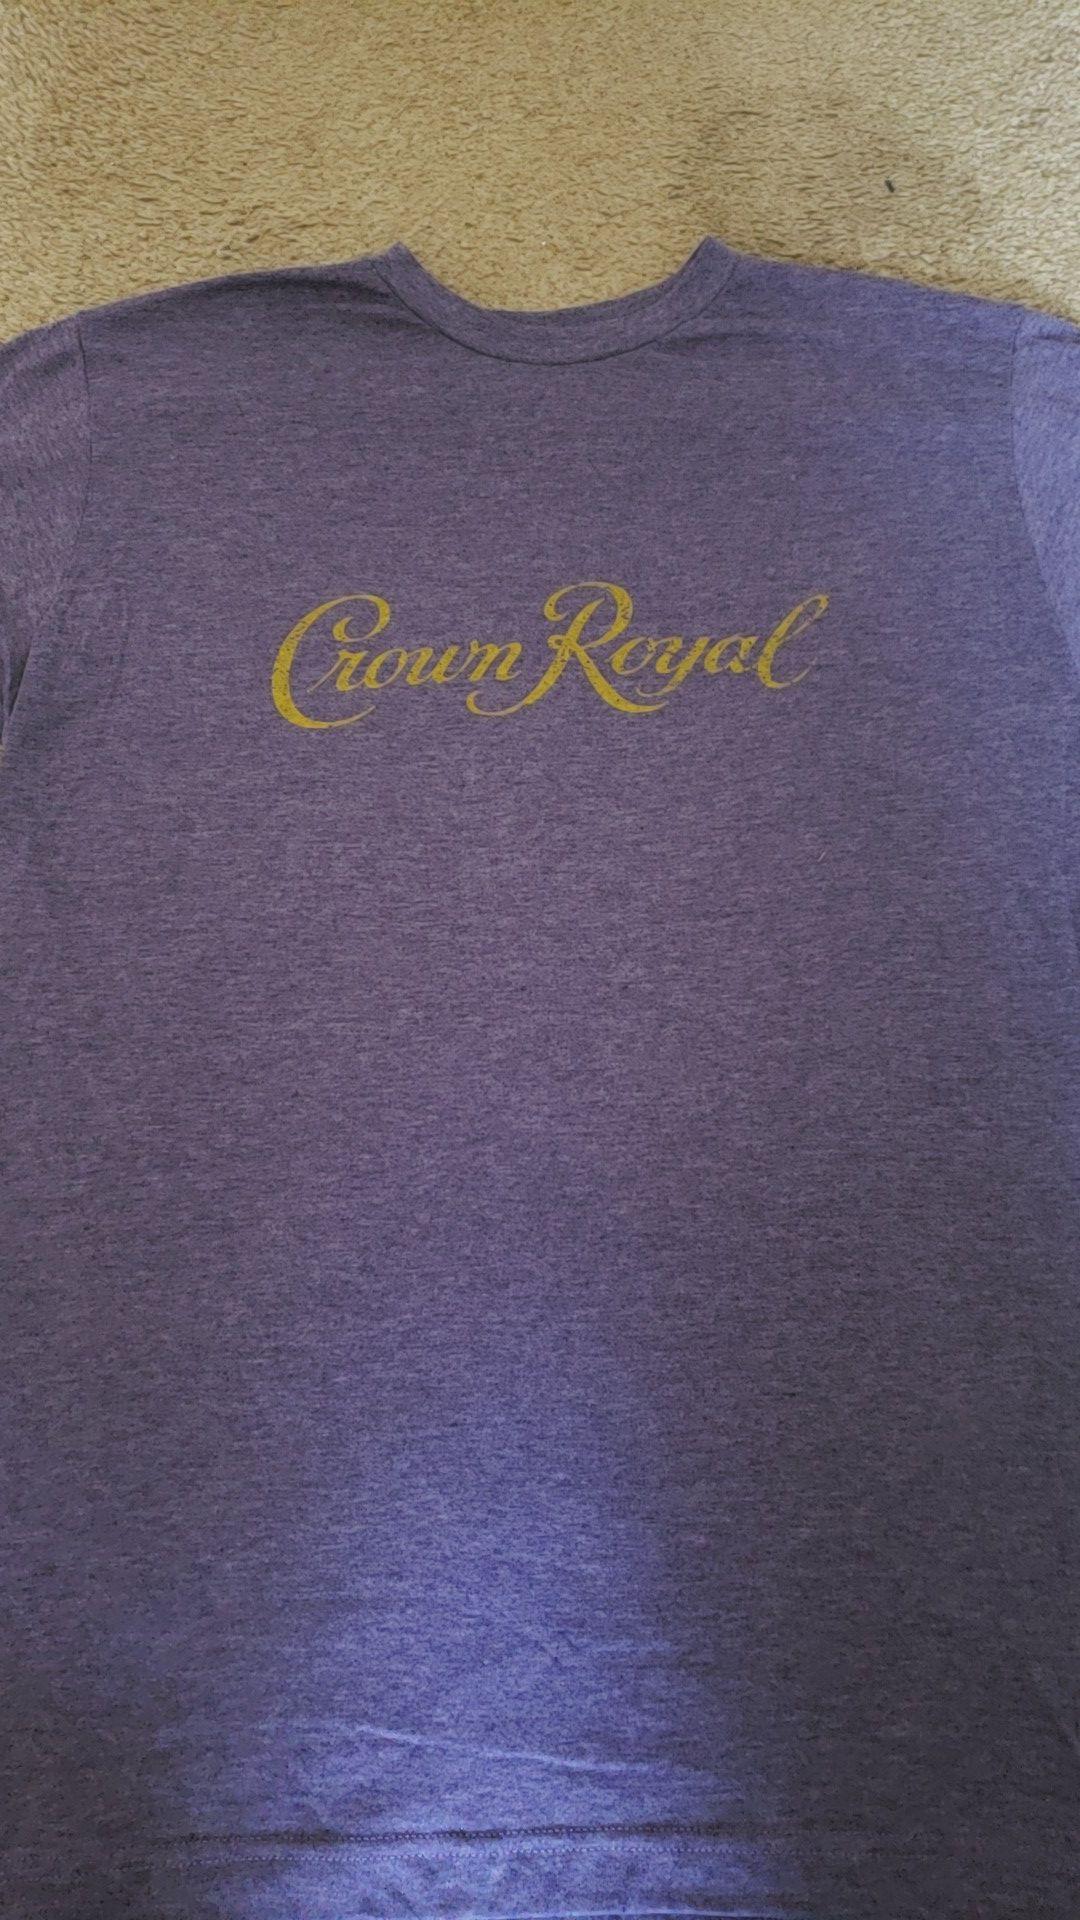 Crown royal t shirt